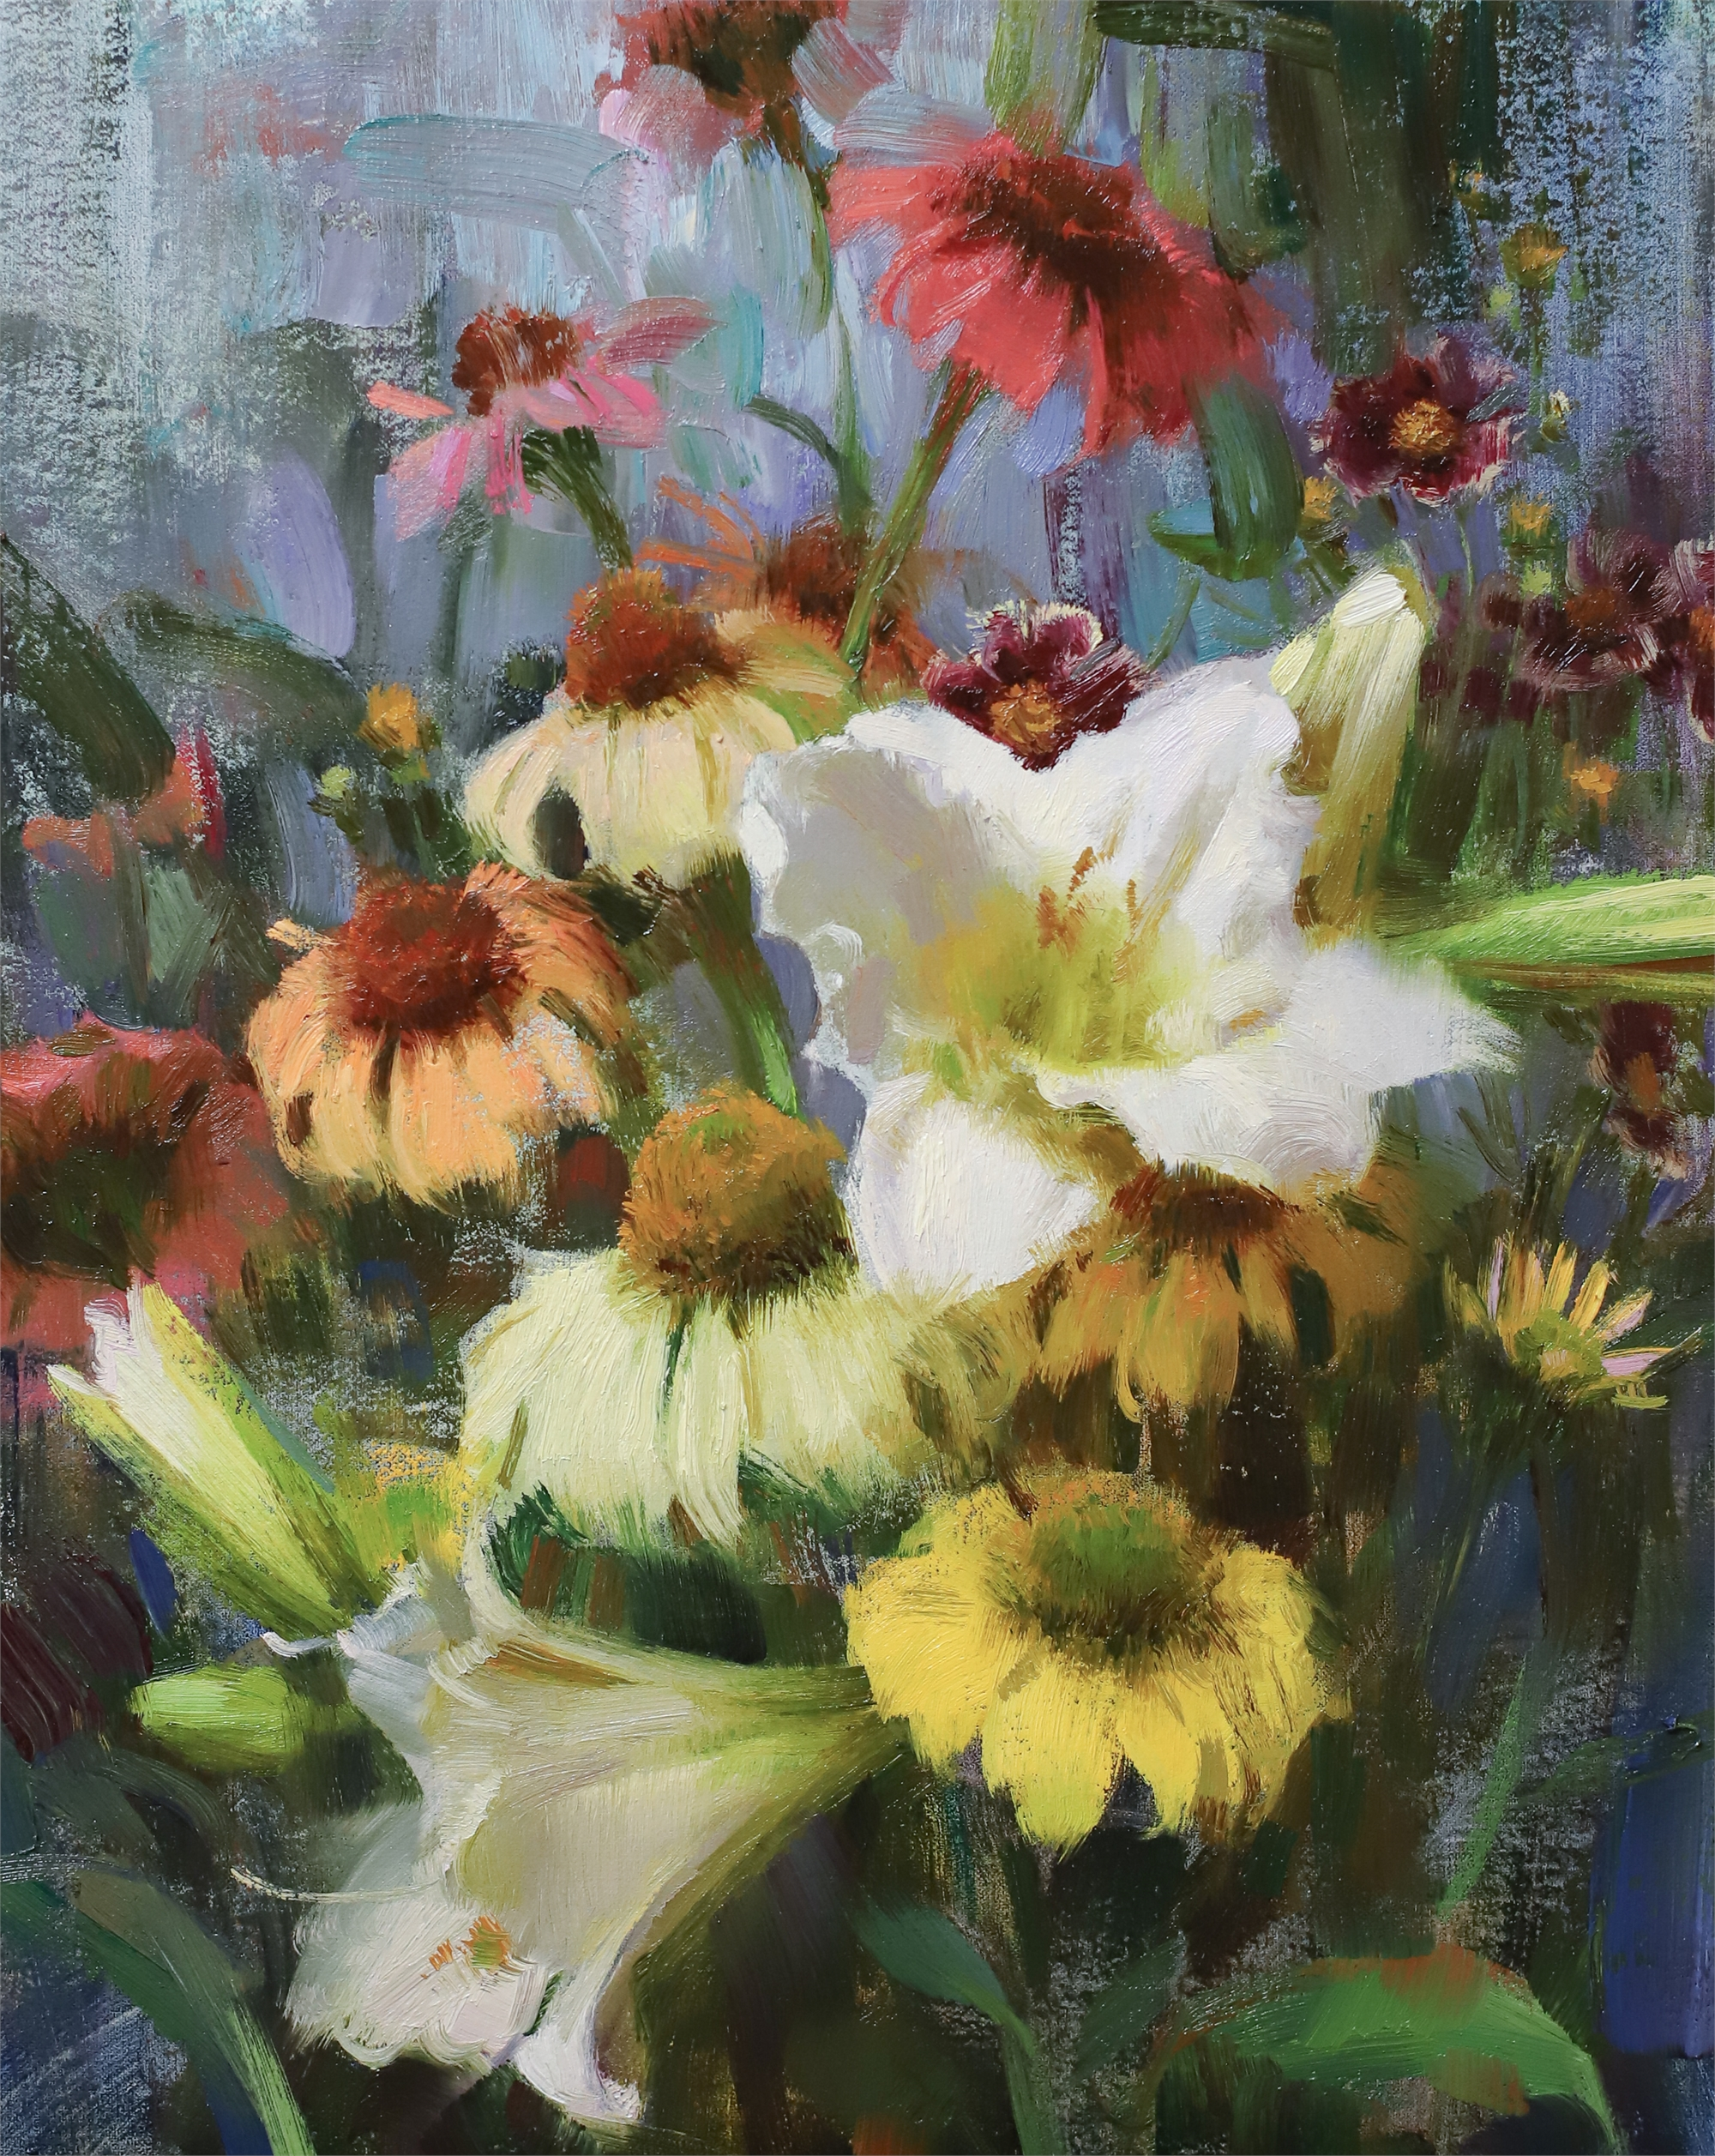 Daylilies, Echinacea, & Coreopsis by Daniel Keys